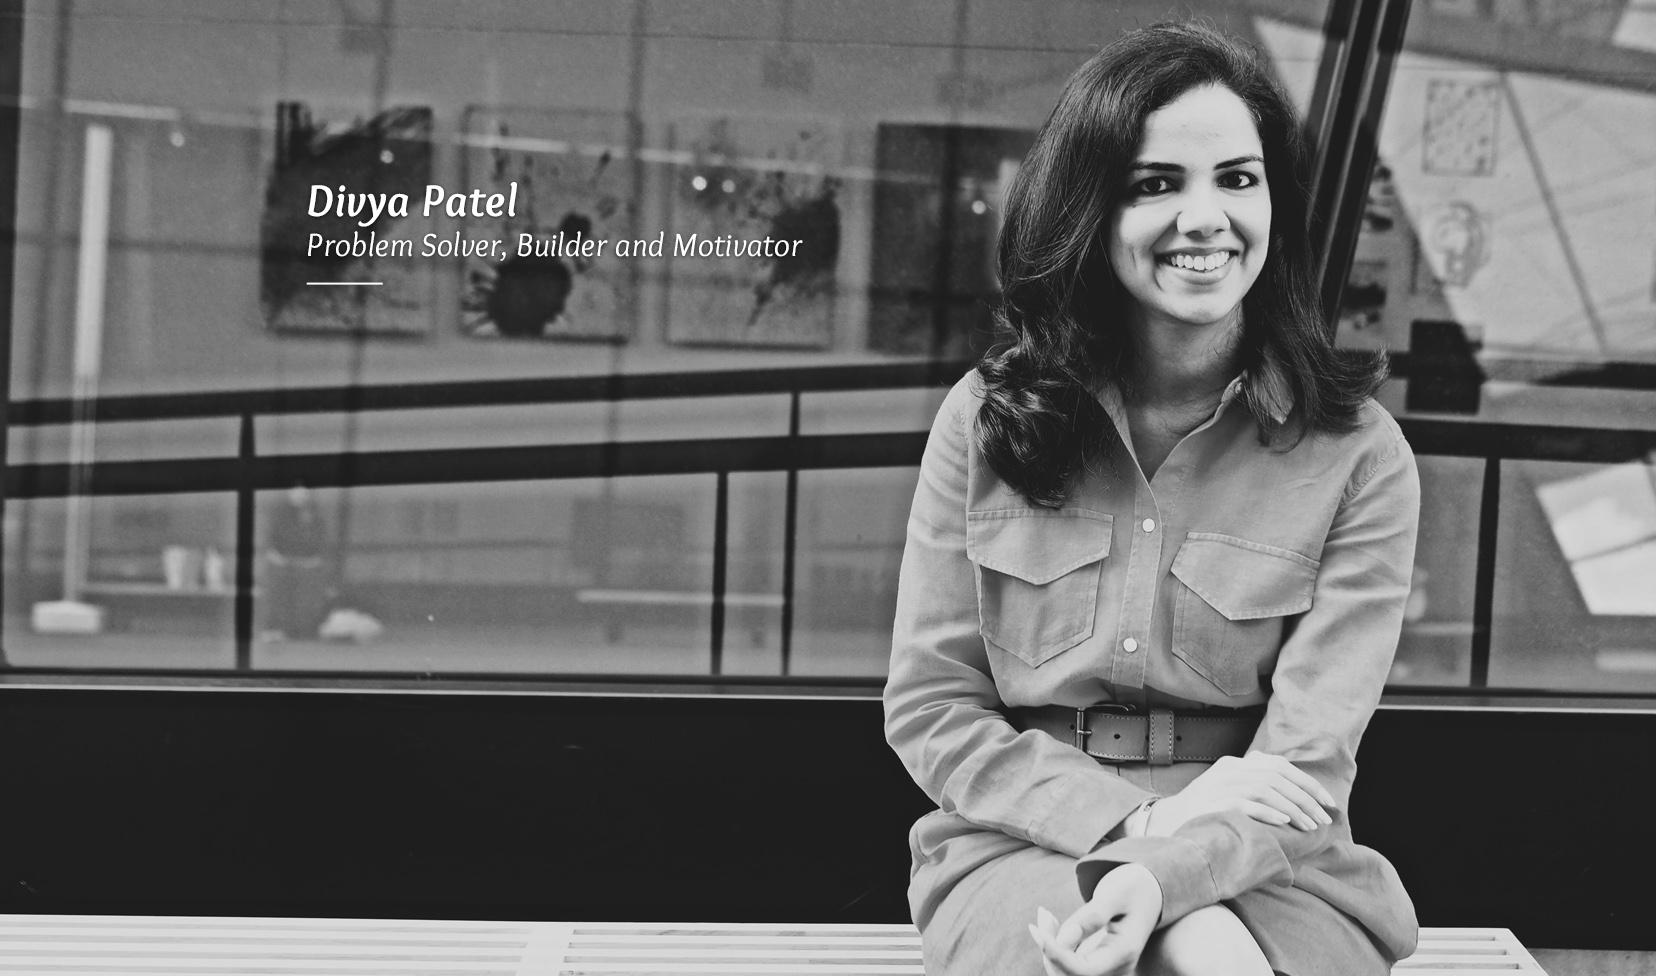 What's Your Story: Divya Patel, Problem solver, Builder, Motivator